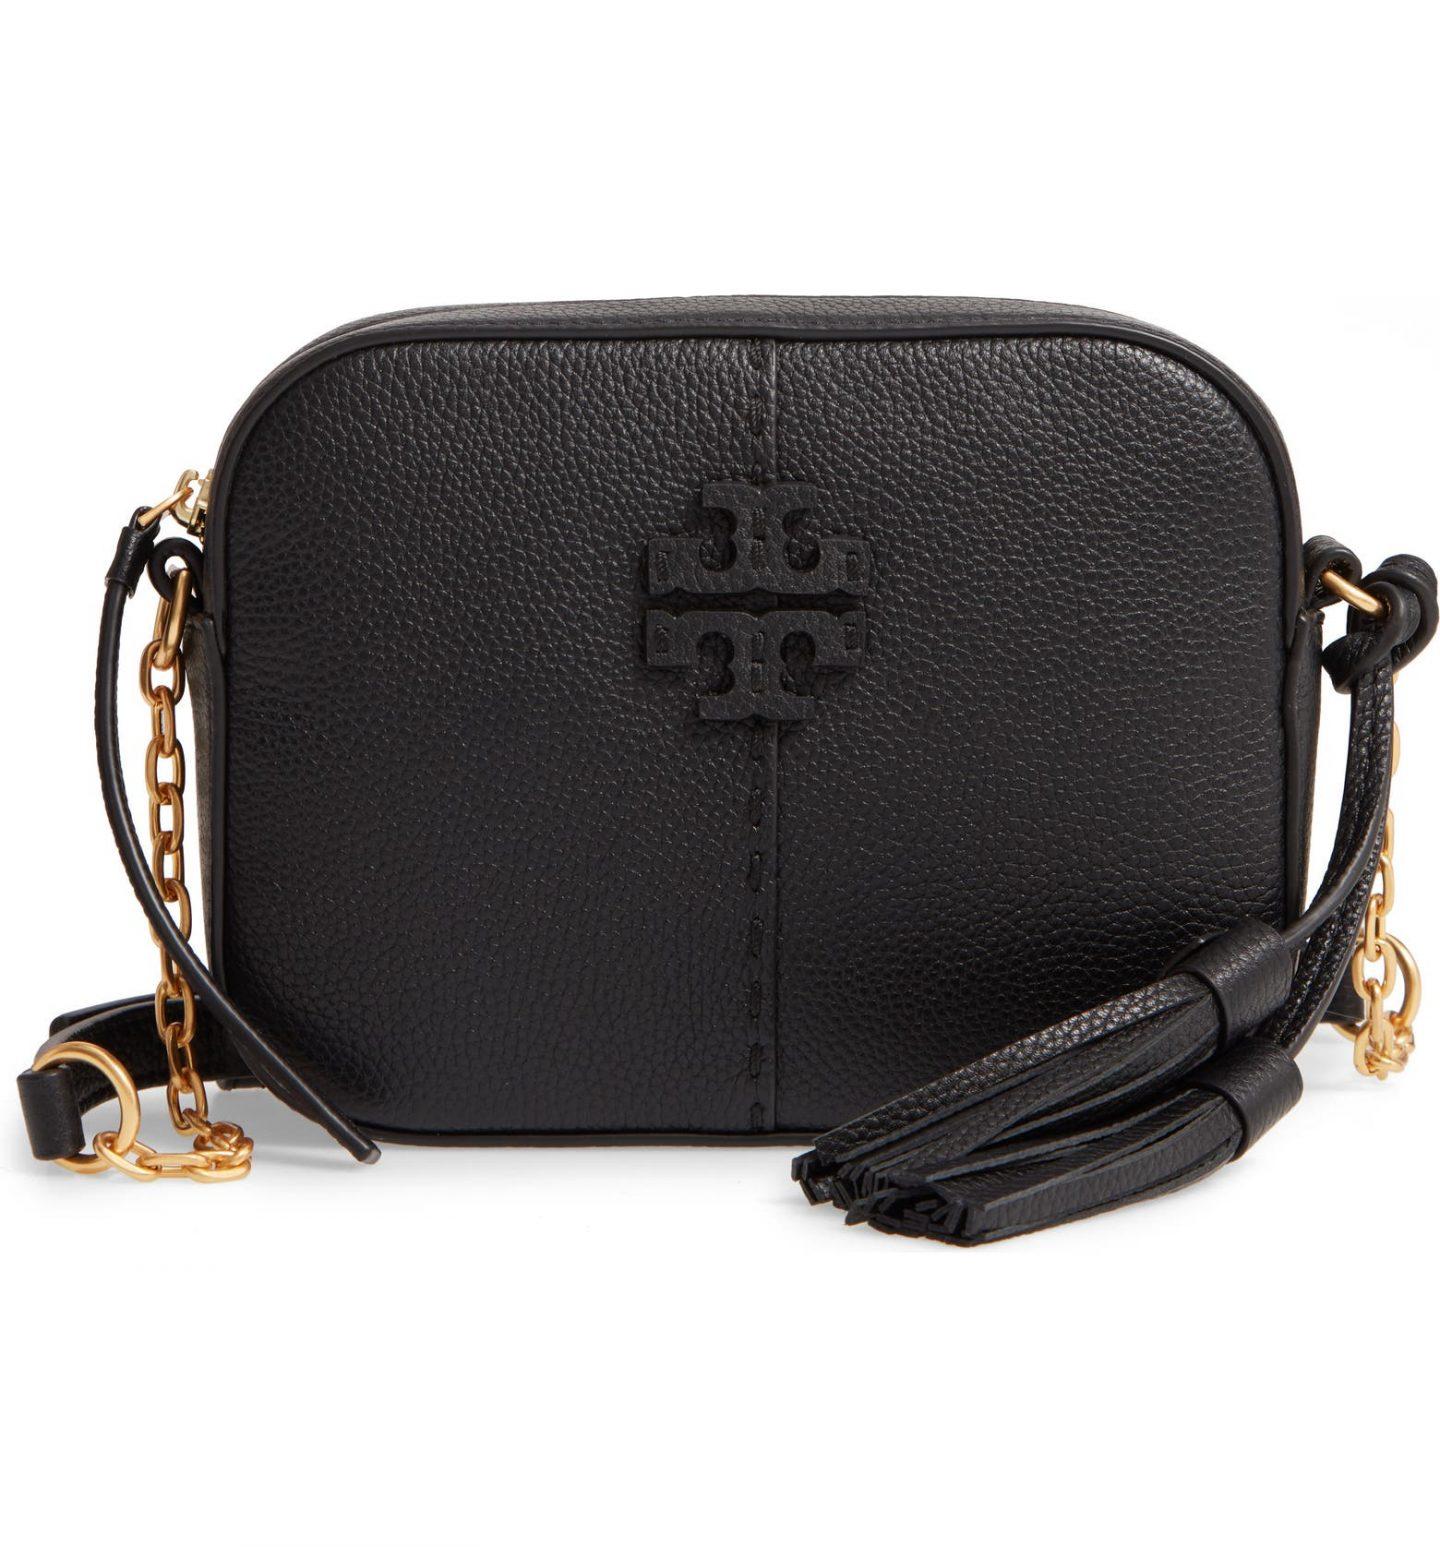 Black minimalist Tory Burch purse